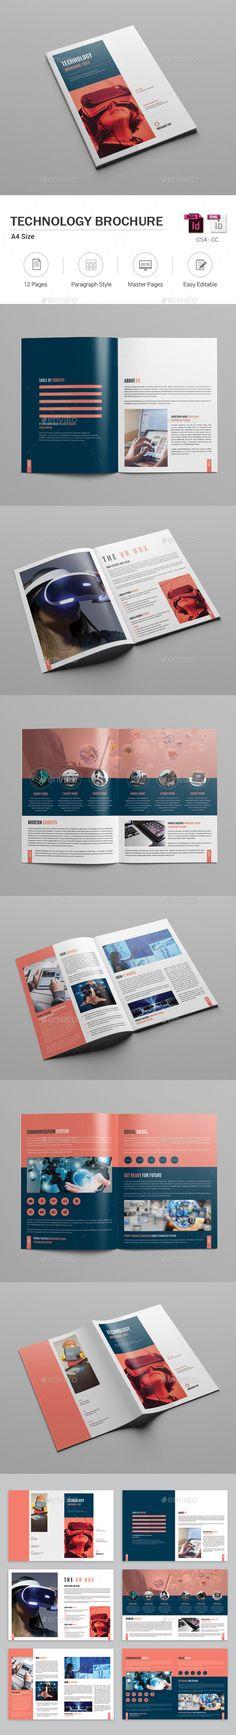 Corporate Bi-Fold Brochure Brochures and Brochure template - technology brochure template